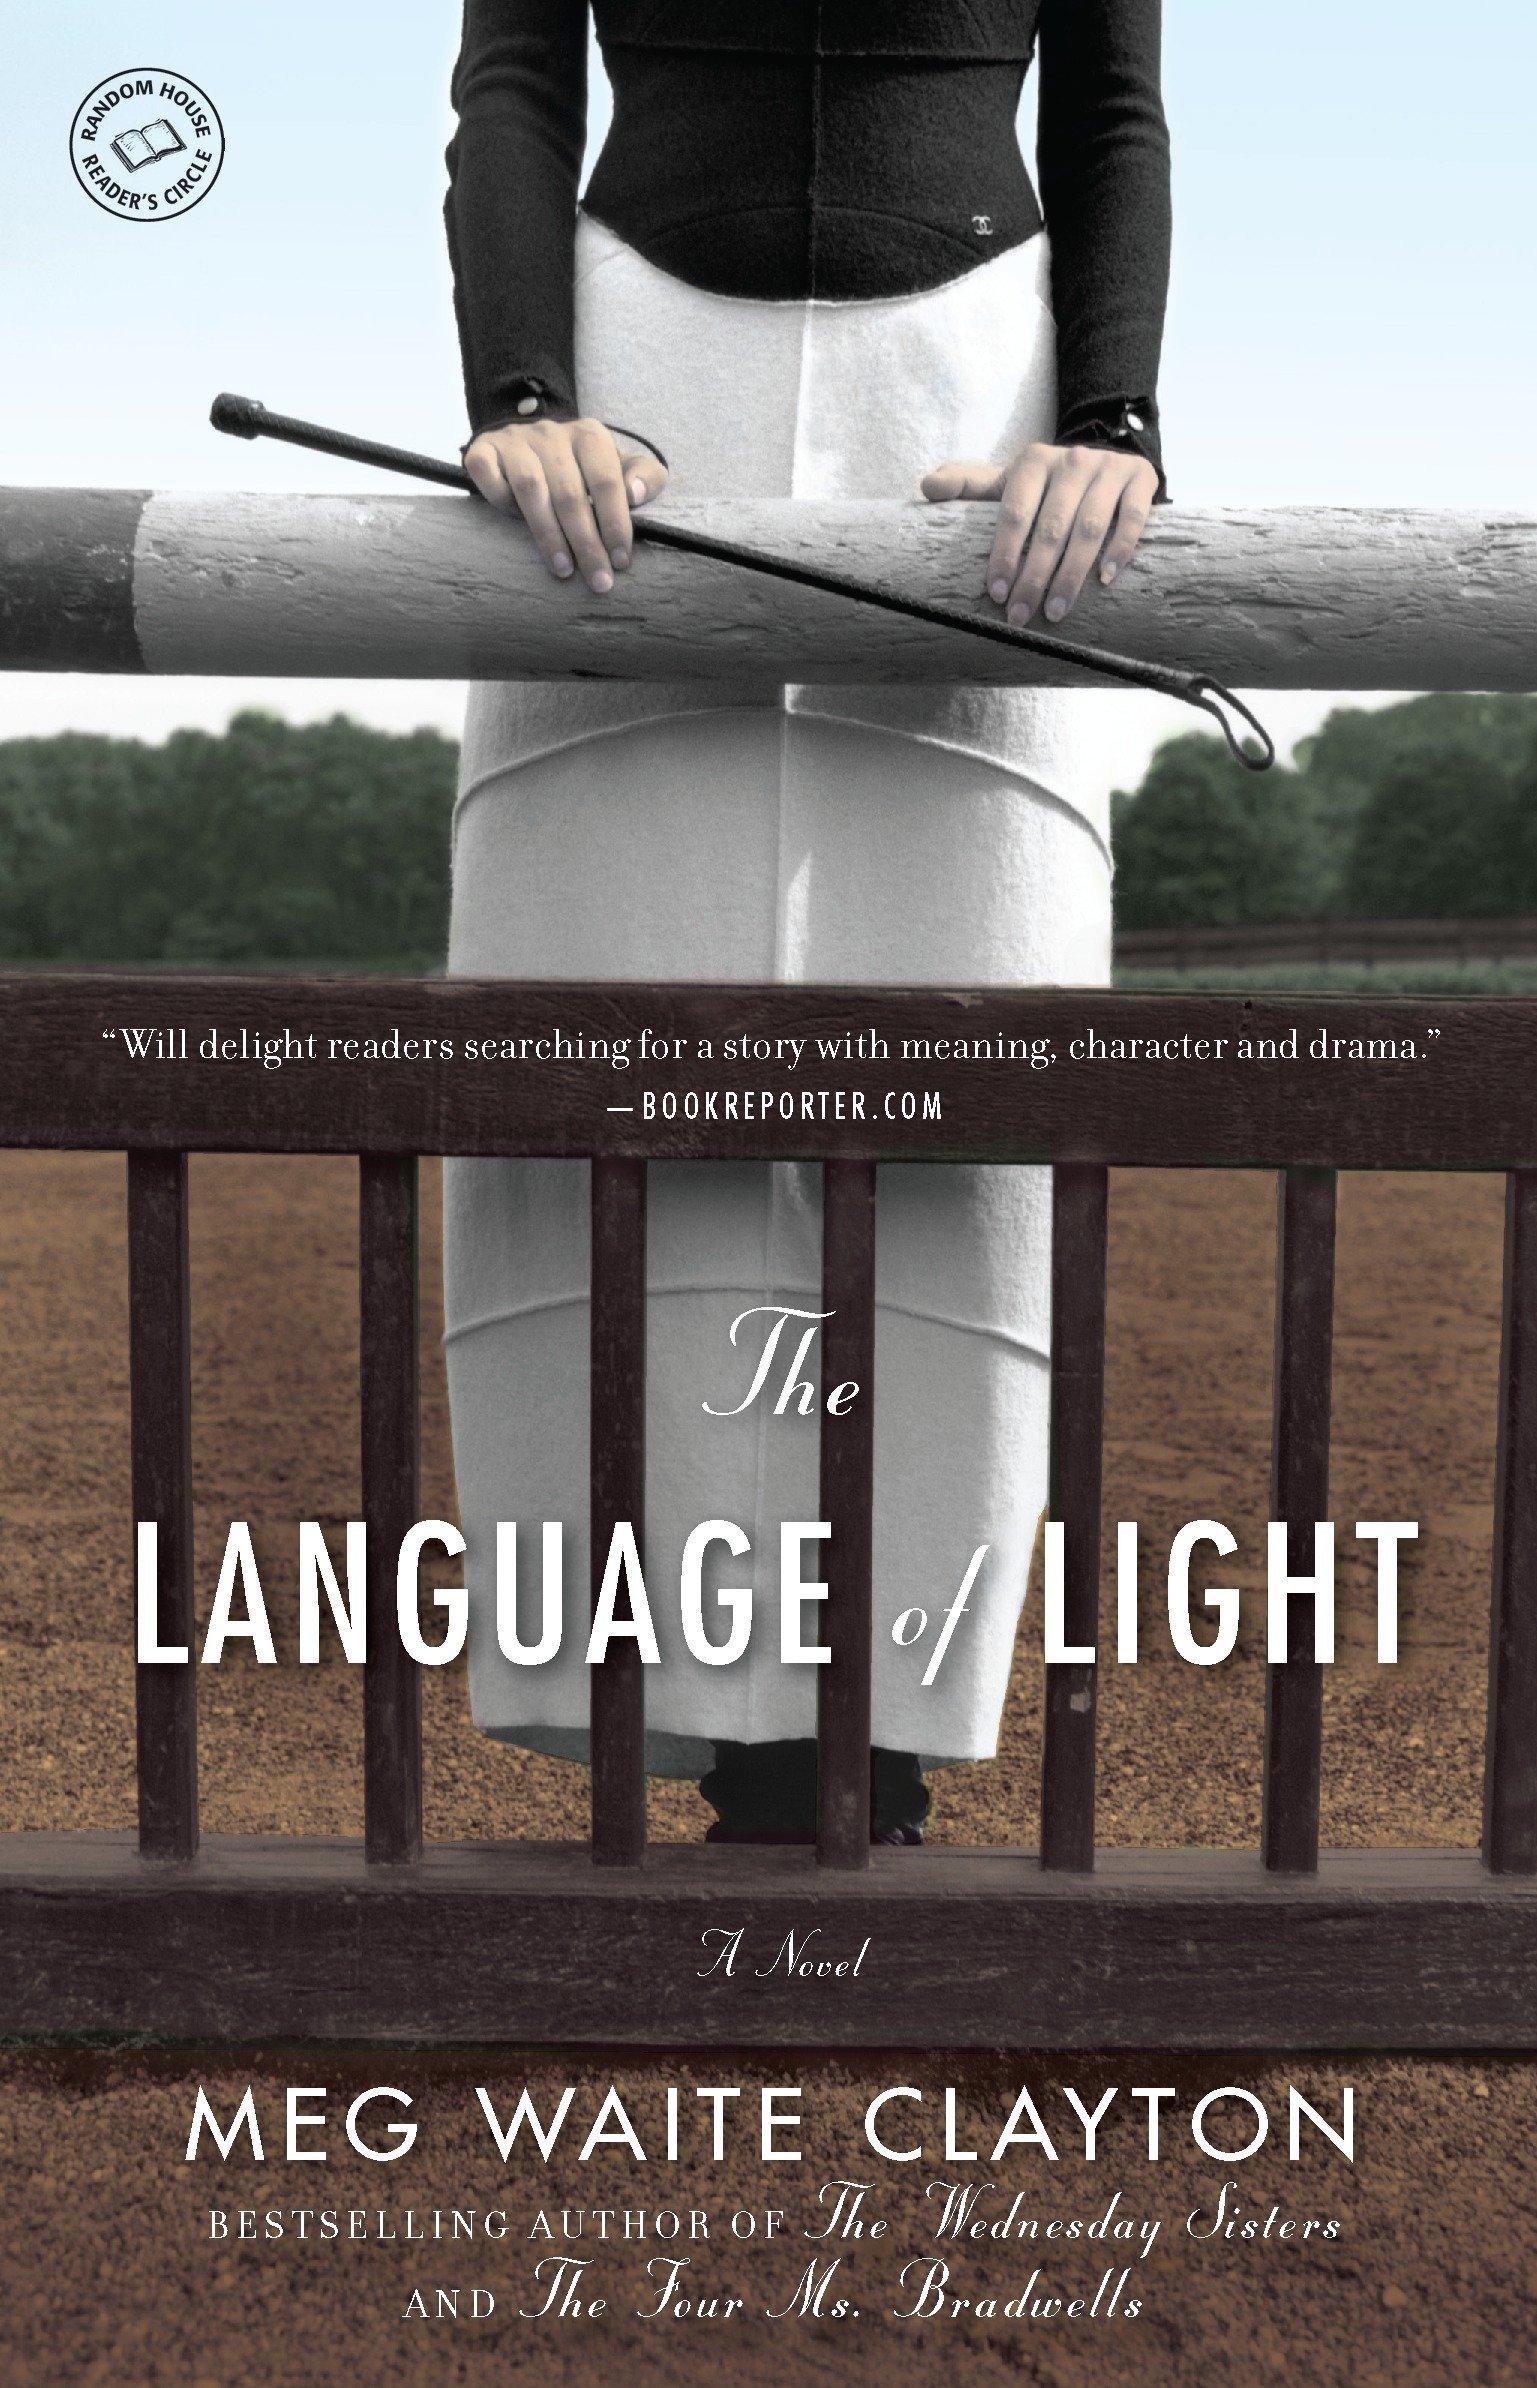 The Language of Light: A Novel